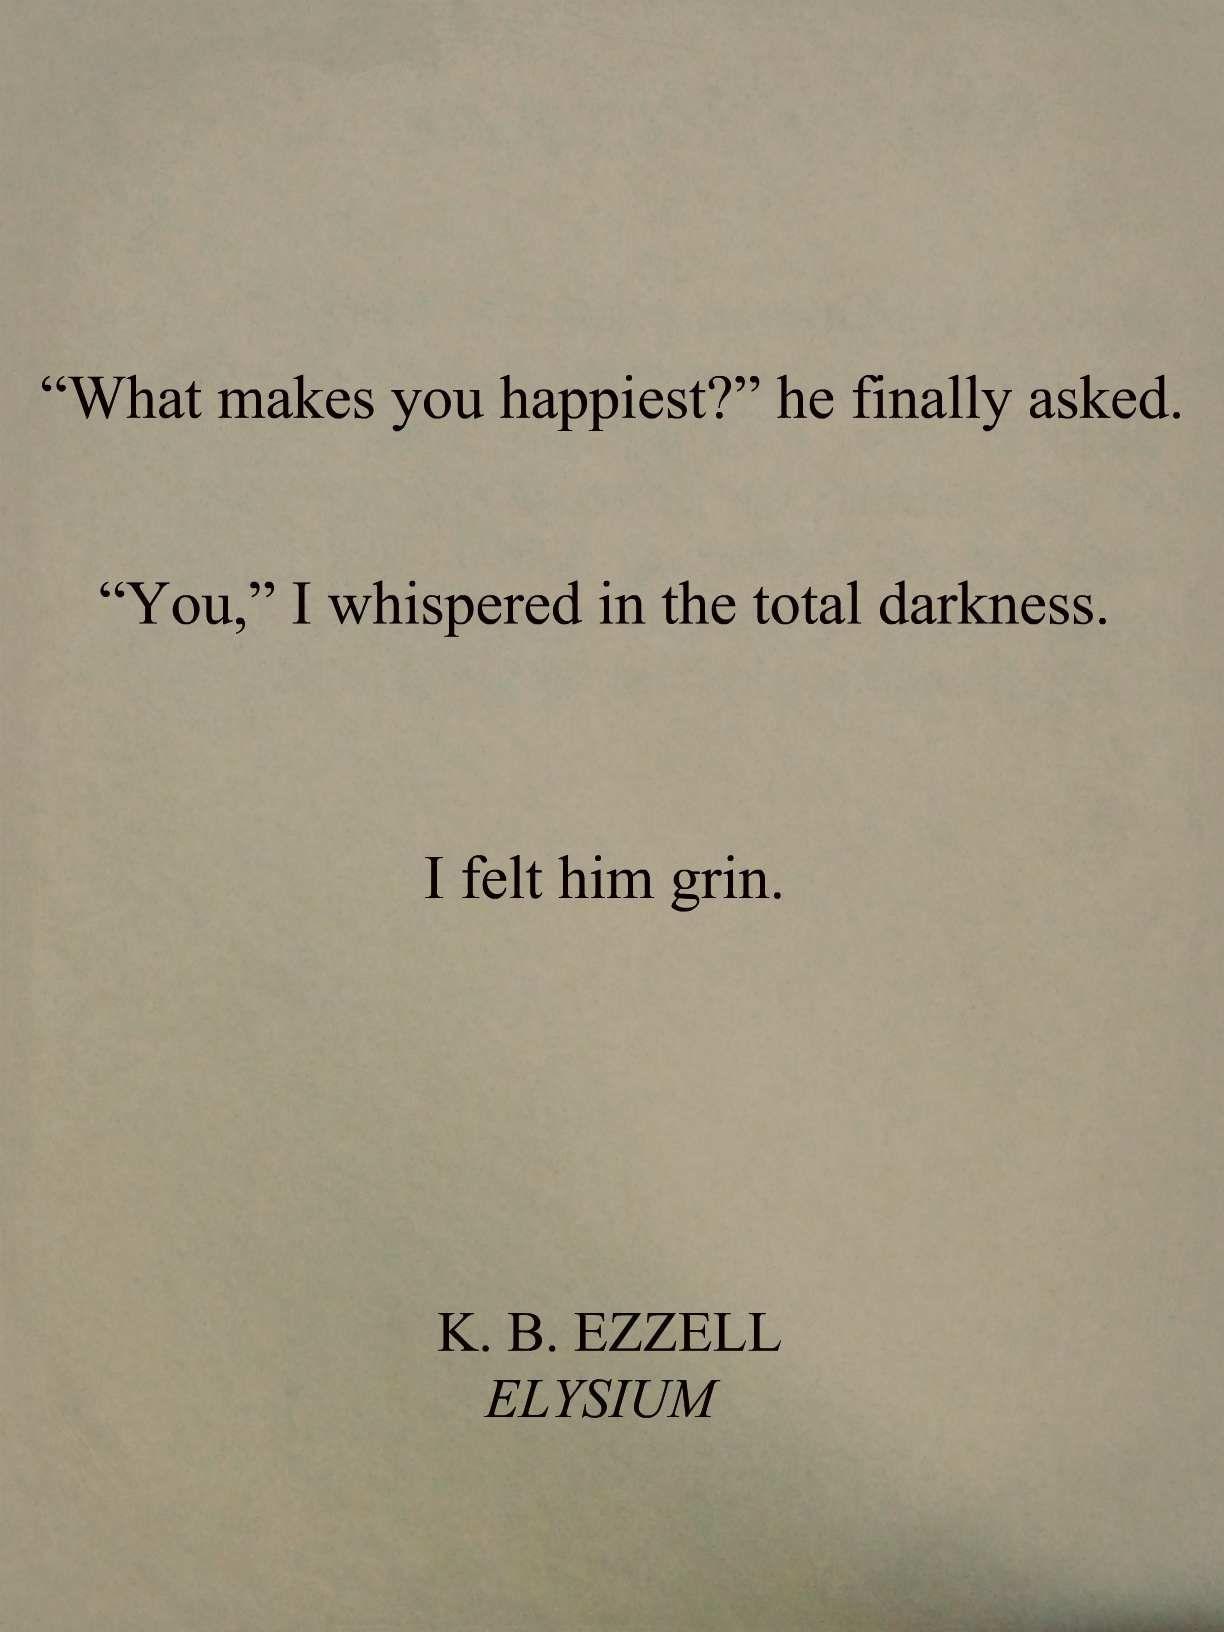 Book Love Quotes Quotes Love Elysium  Book Love  Pinterest